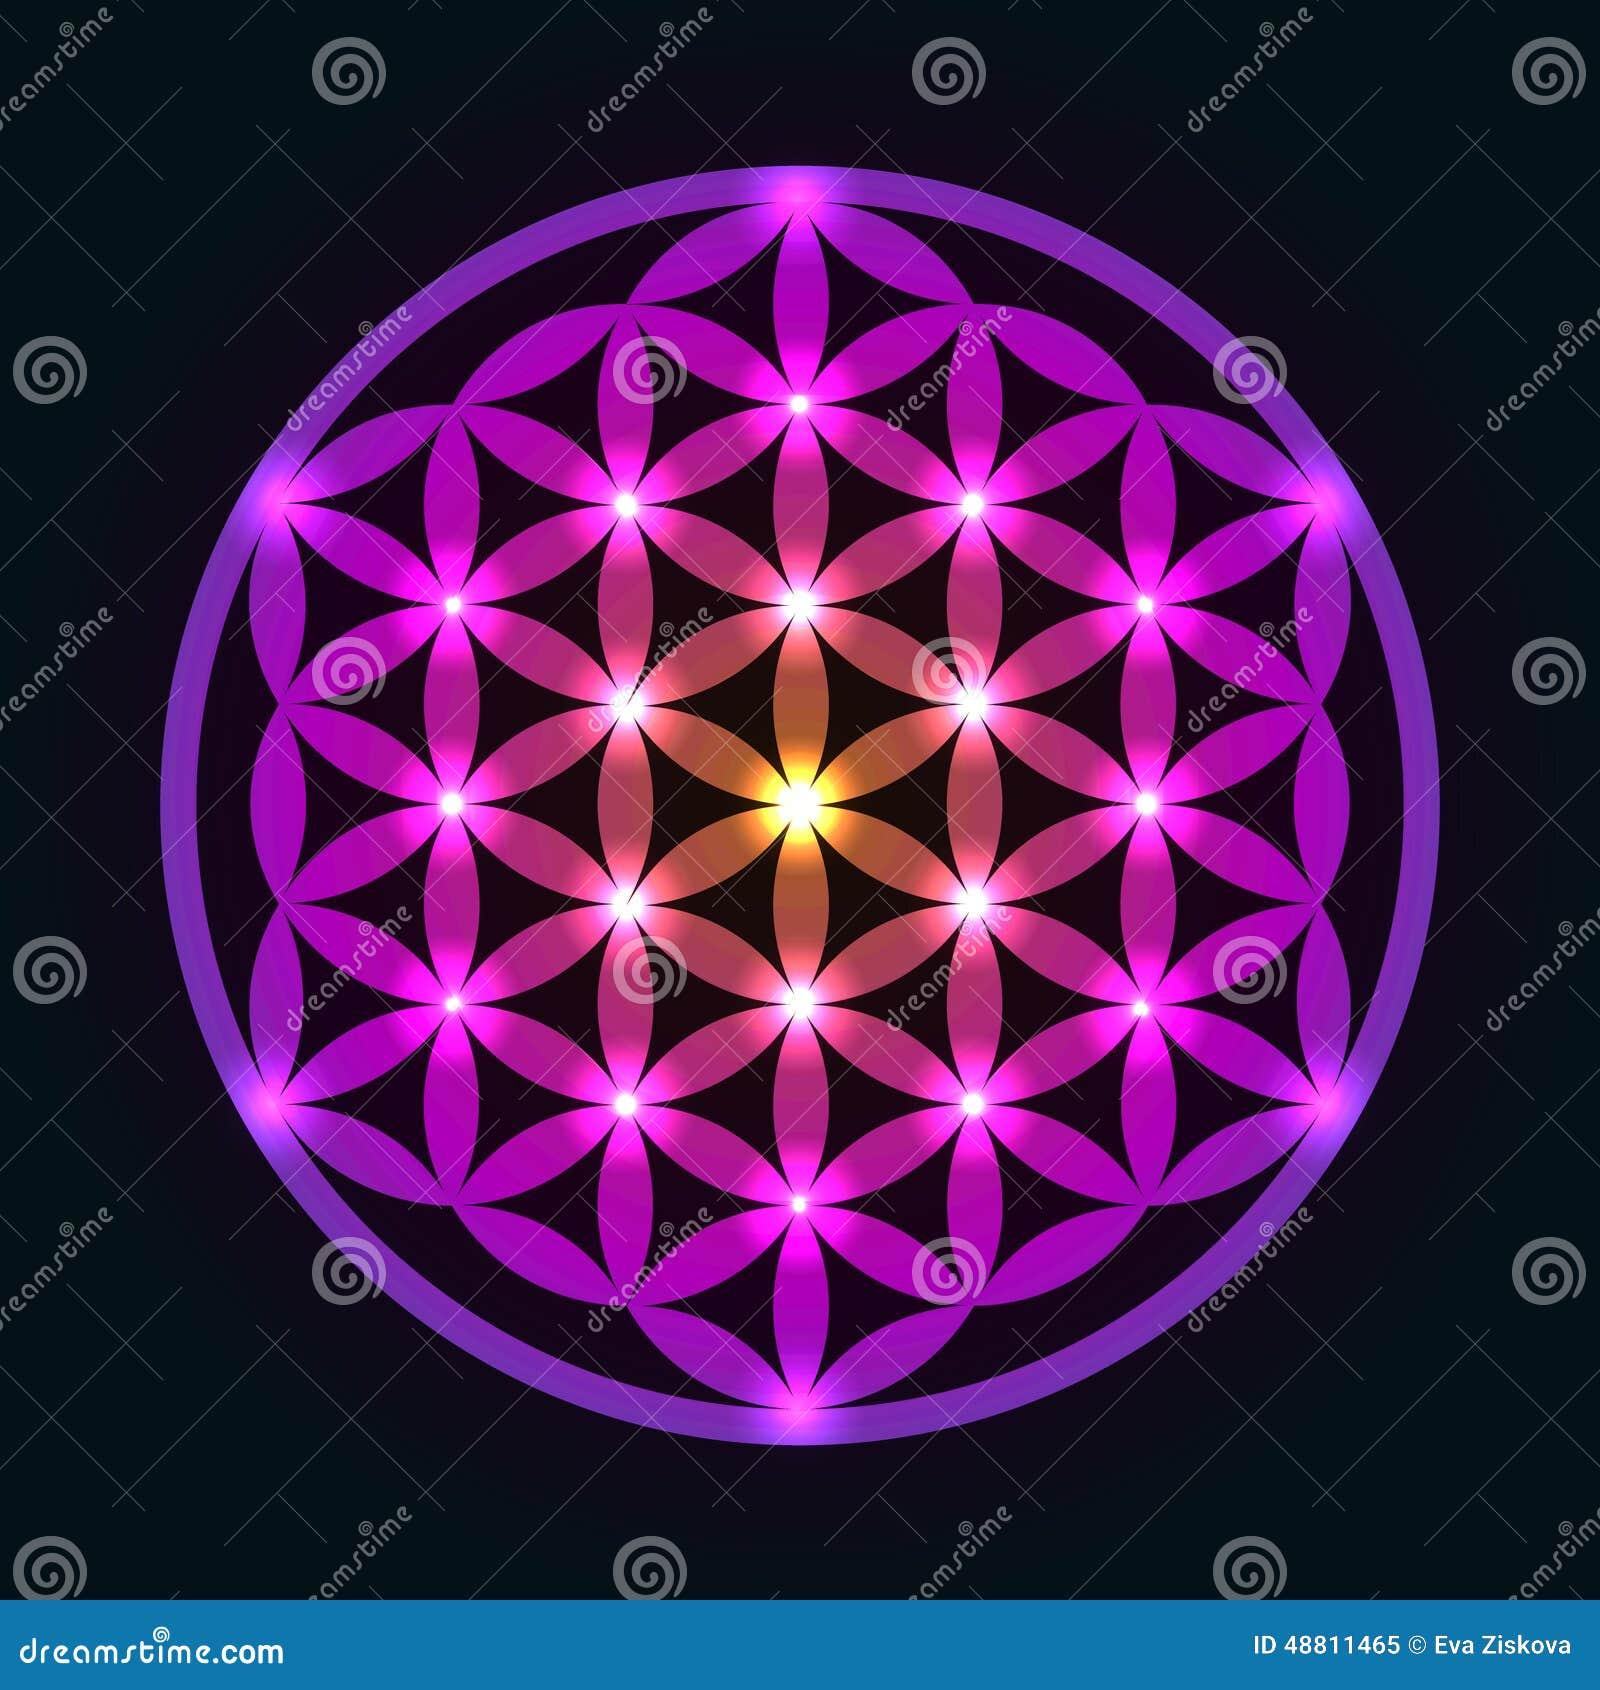 Glowing Geometrical Flower of Life